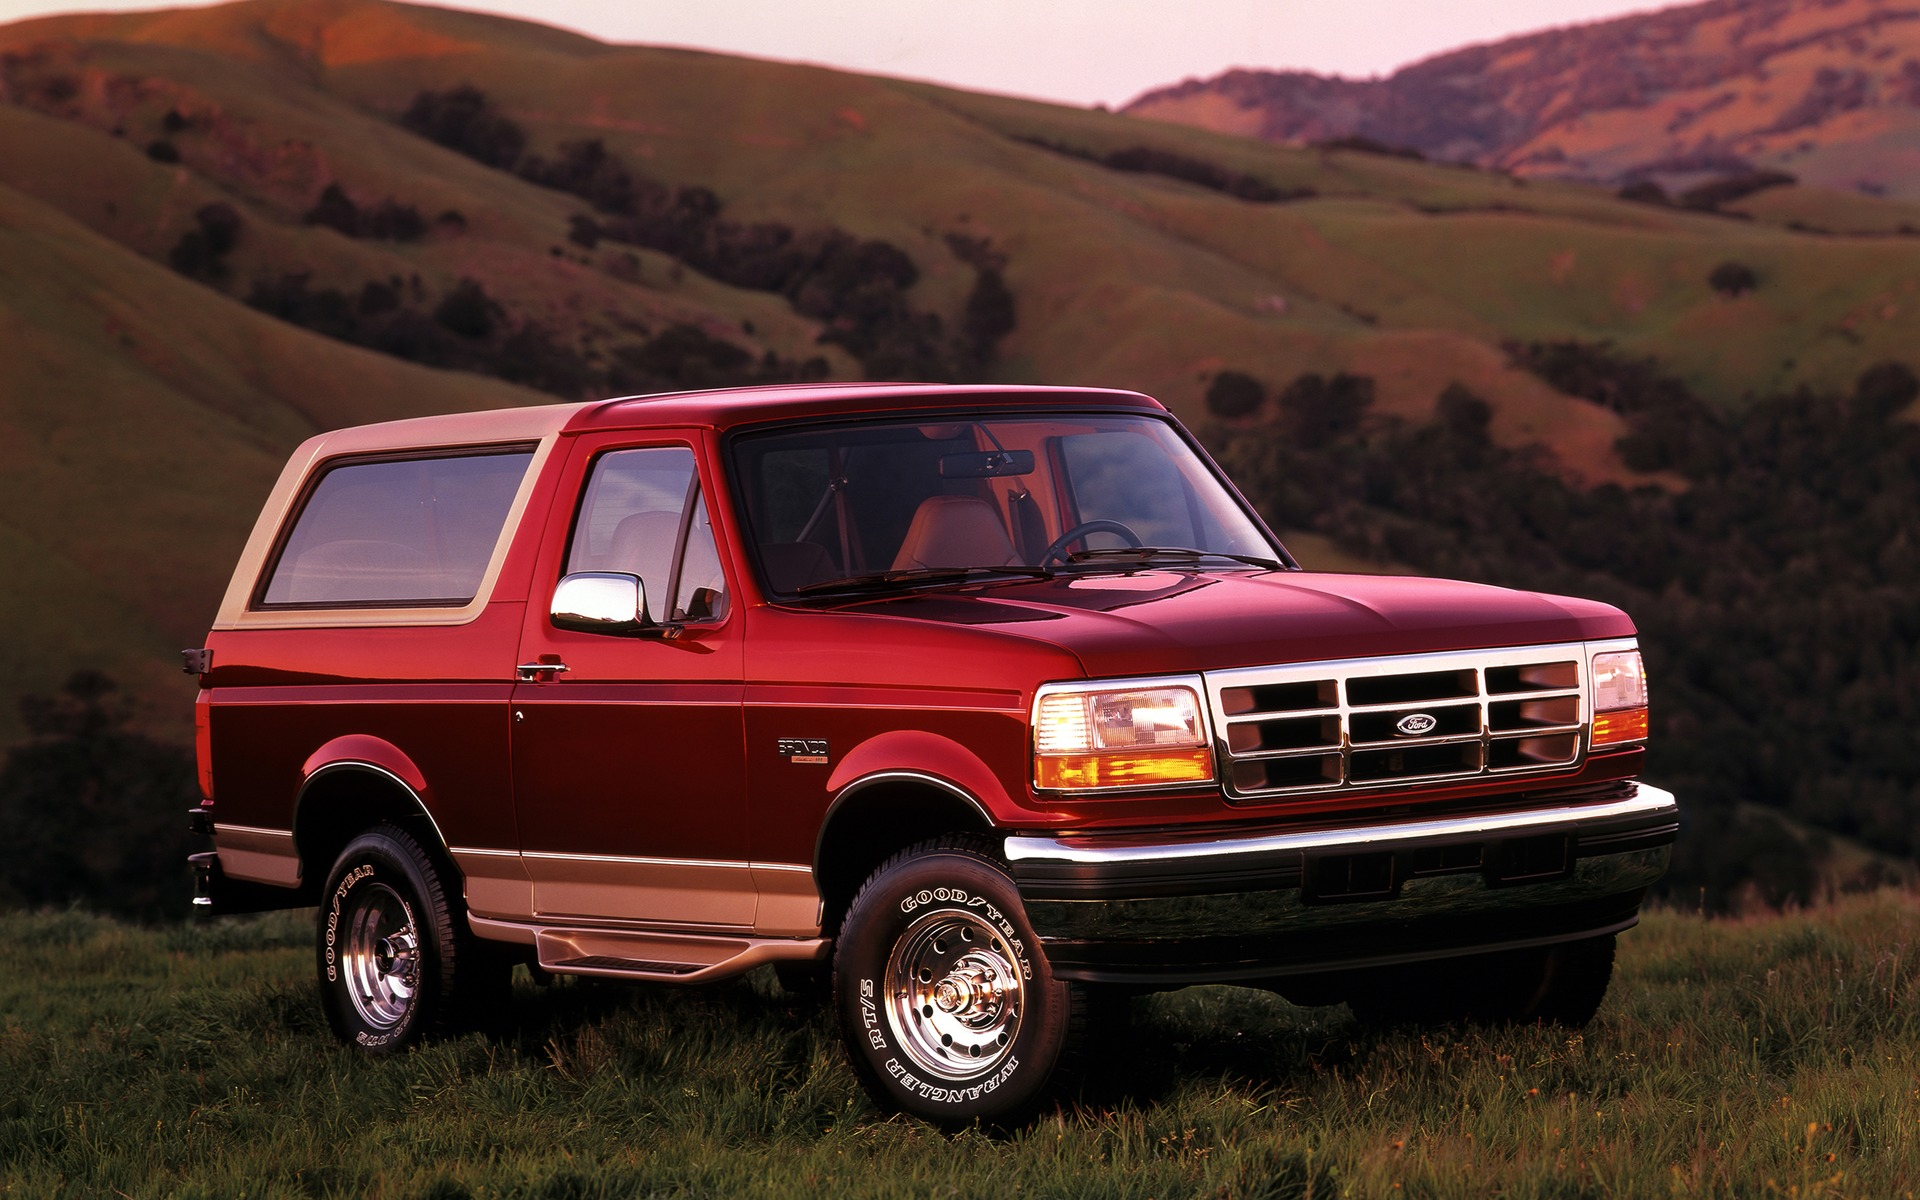 <p>Ford Bronco Eddie Bauer 1996</p>